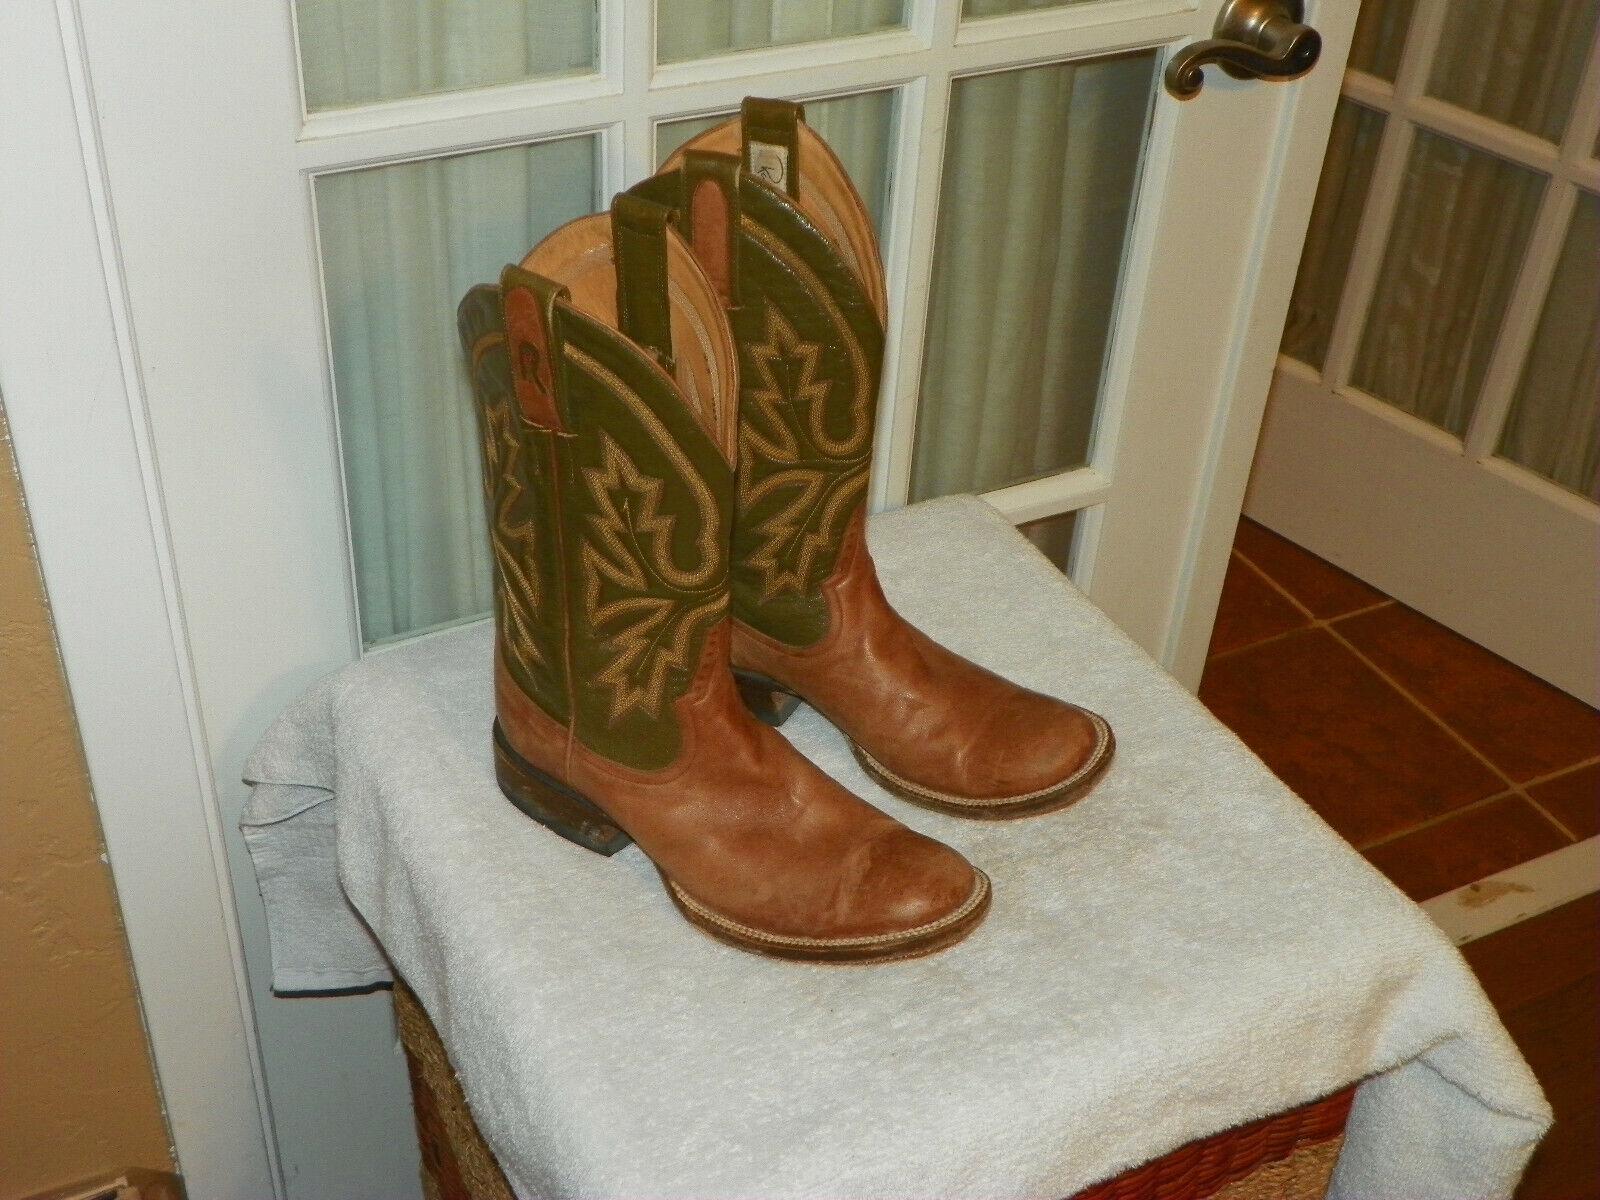 Varilla Patrick botamakers Punta rojoonda botas de vaquero occidental para mujer B